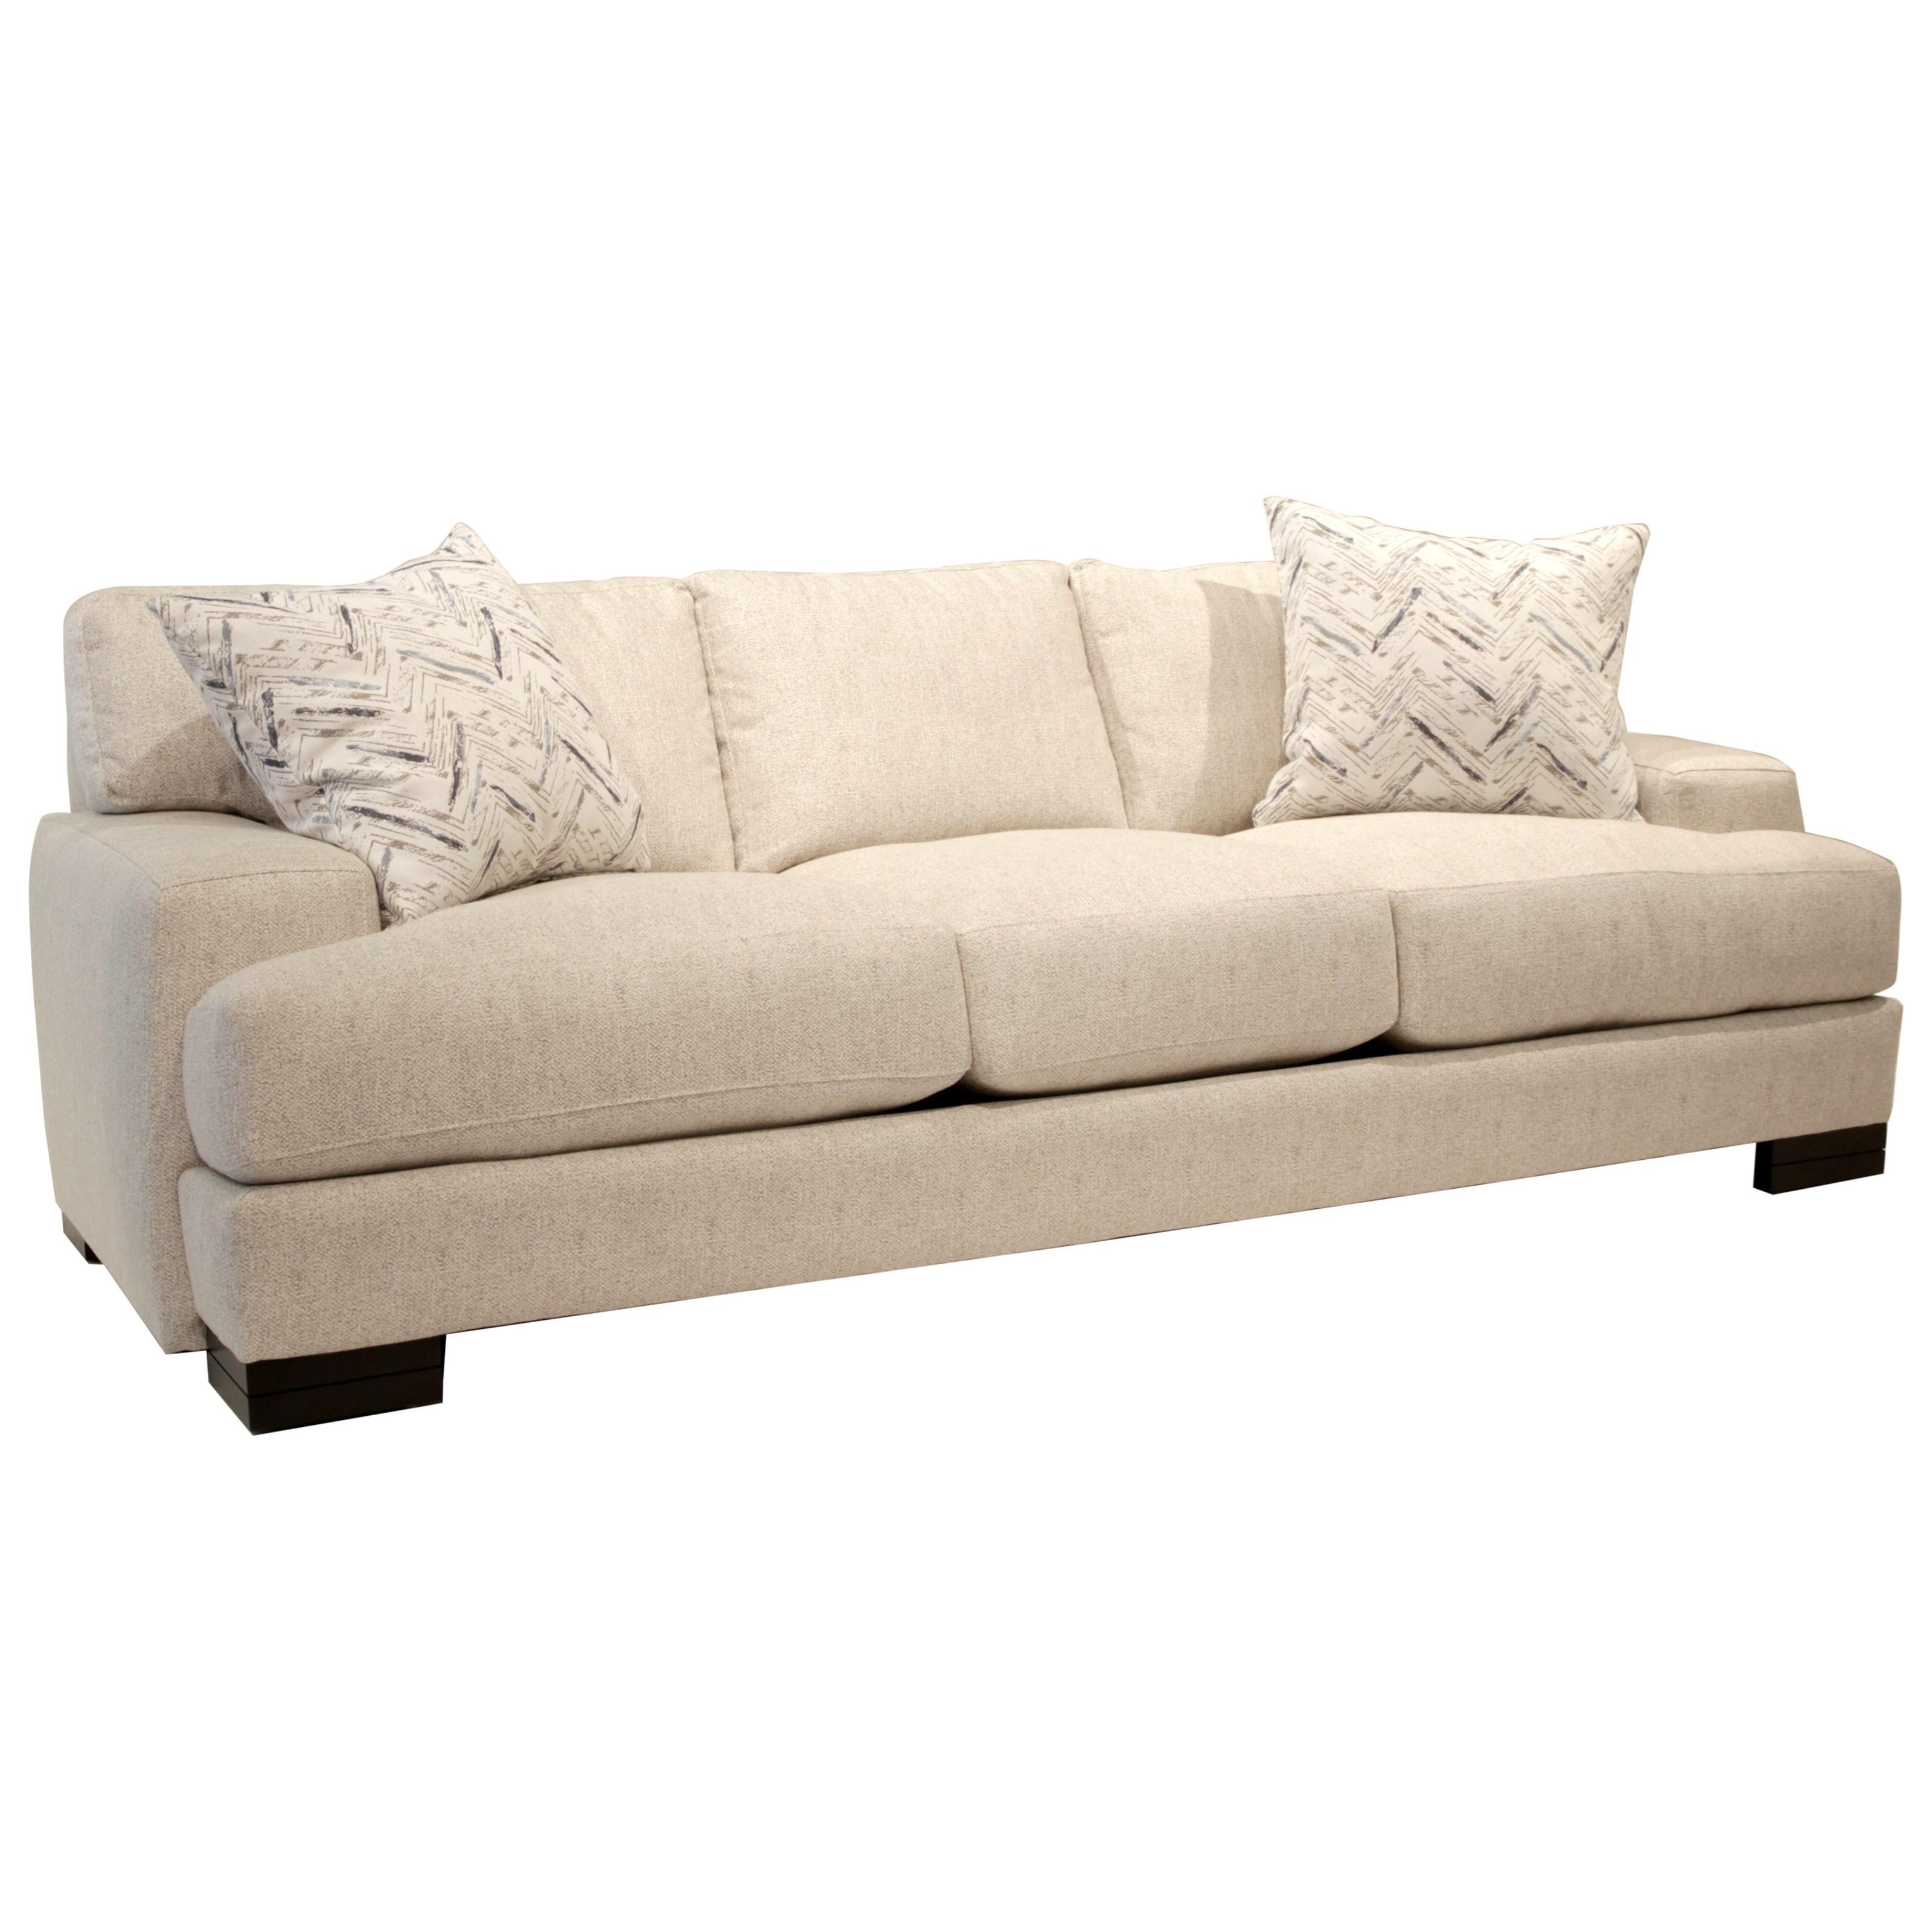 Burton Leather Sofa: Jonathan Louis Burton Modern Sofa With Low Track Arms And